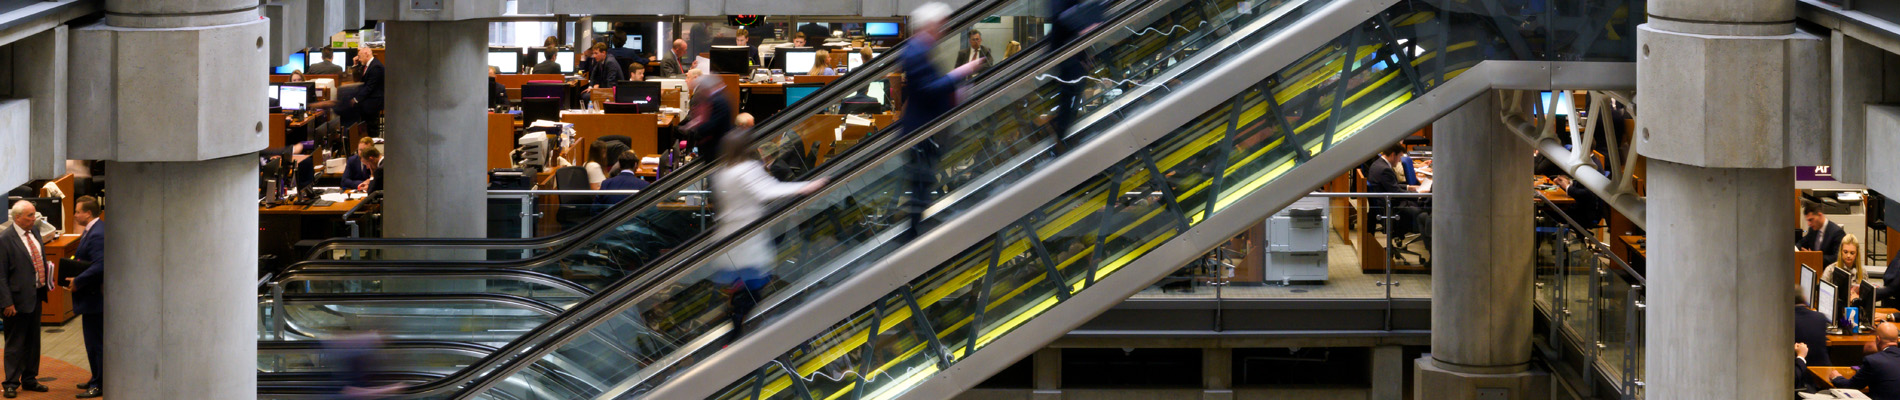 Banner image of escalators in underwriting room